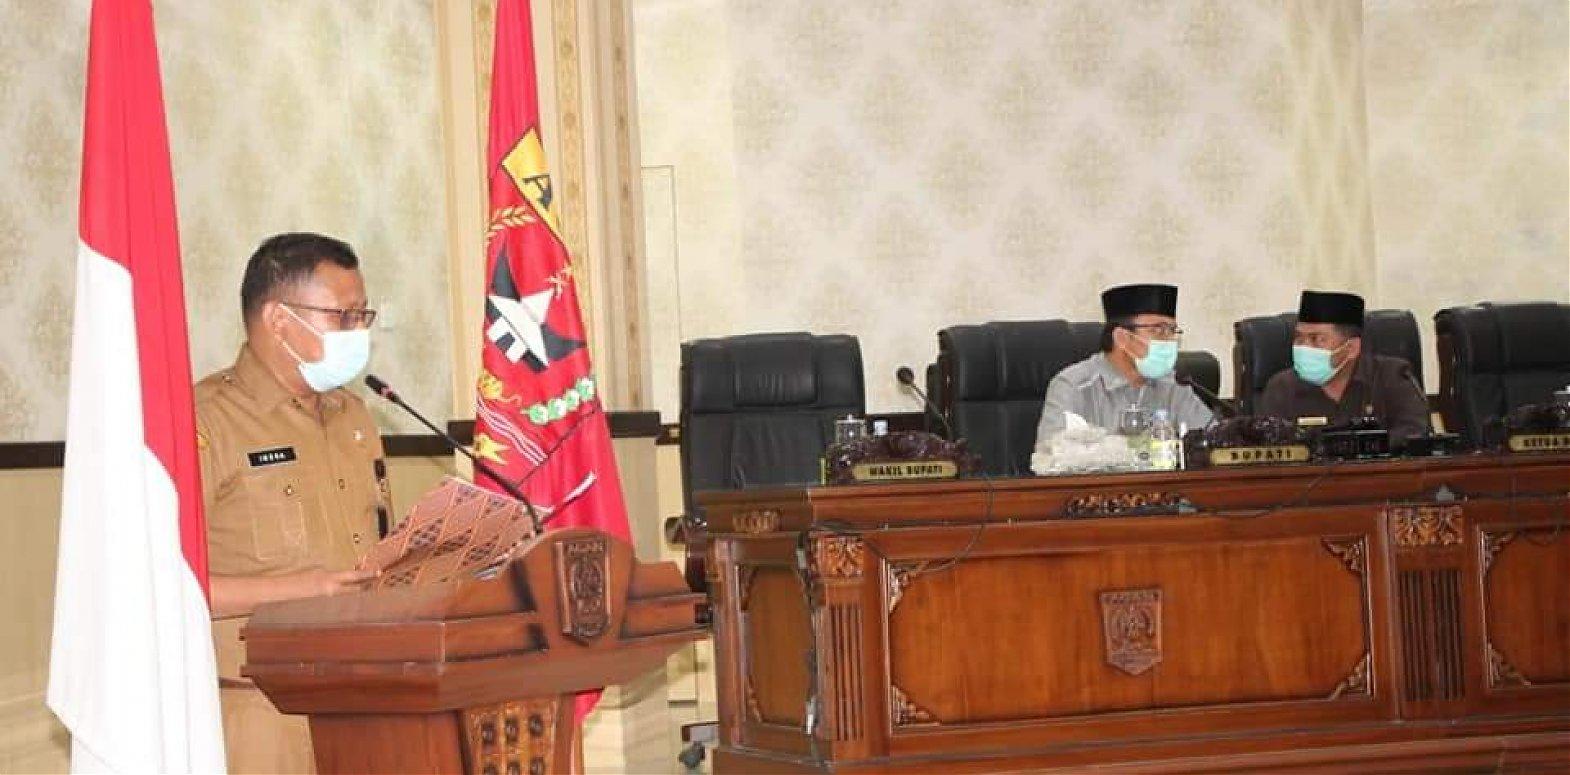 Masa Jabatan Bupati dan Wakil Bupati  Agam periode  2016-2021 Berakhir, DPRD Gelar Paripurna Pengusulan Pemberhentian